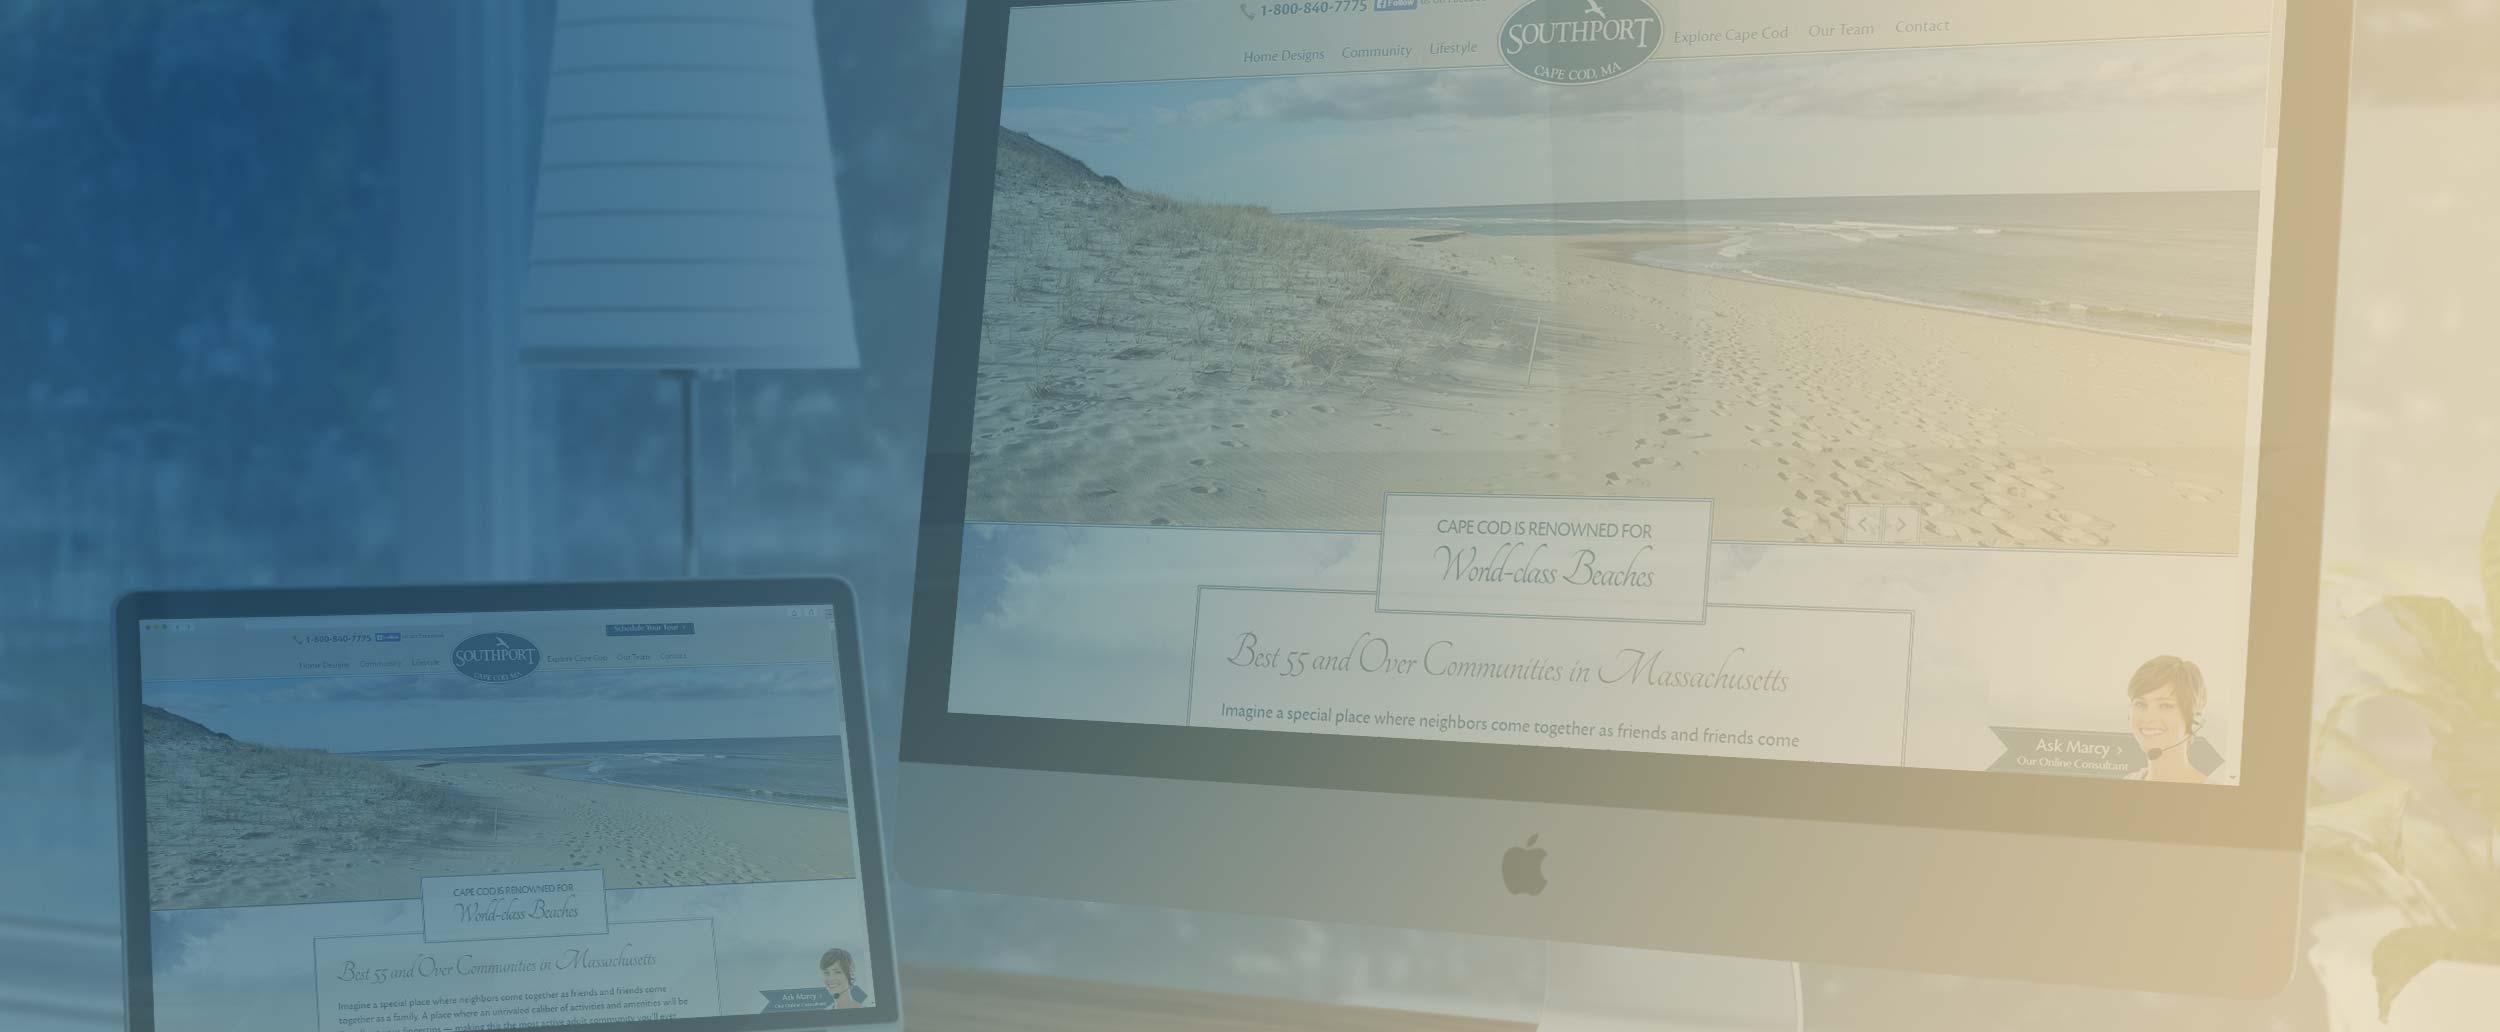 Website & Digital Marketing – Advantages of Using Professional Videos